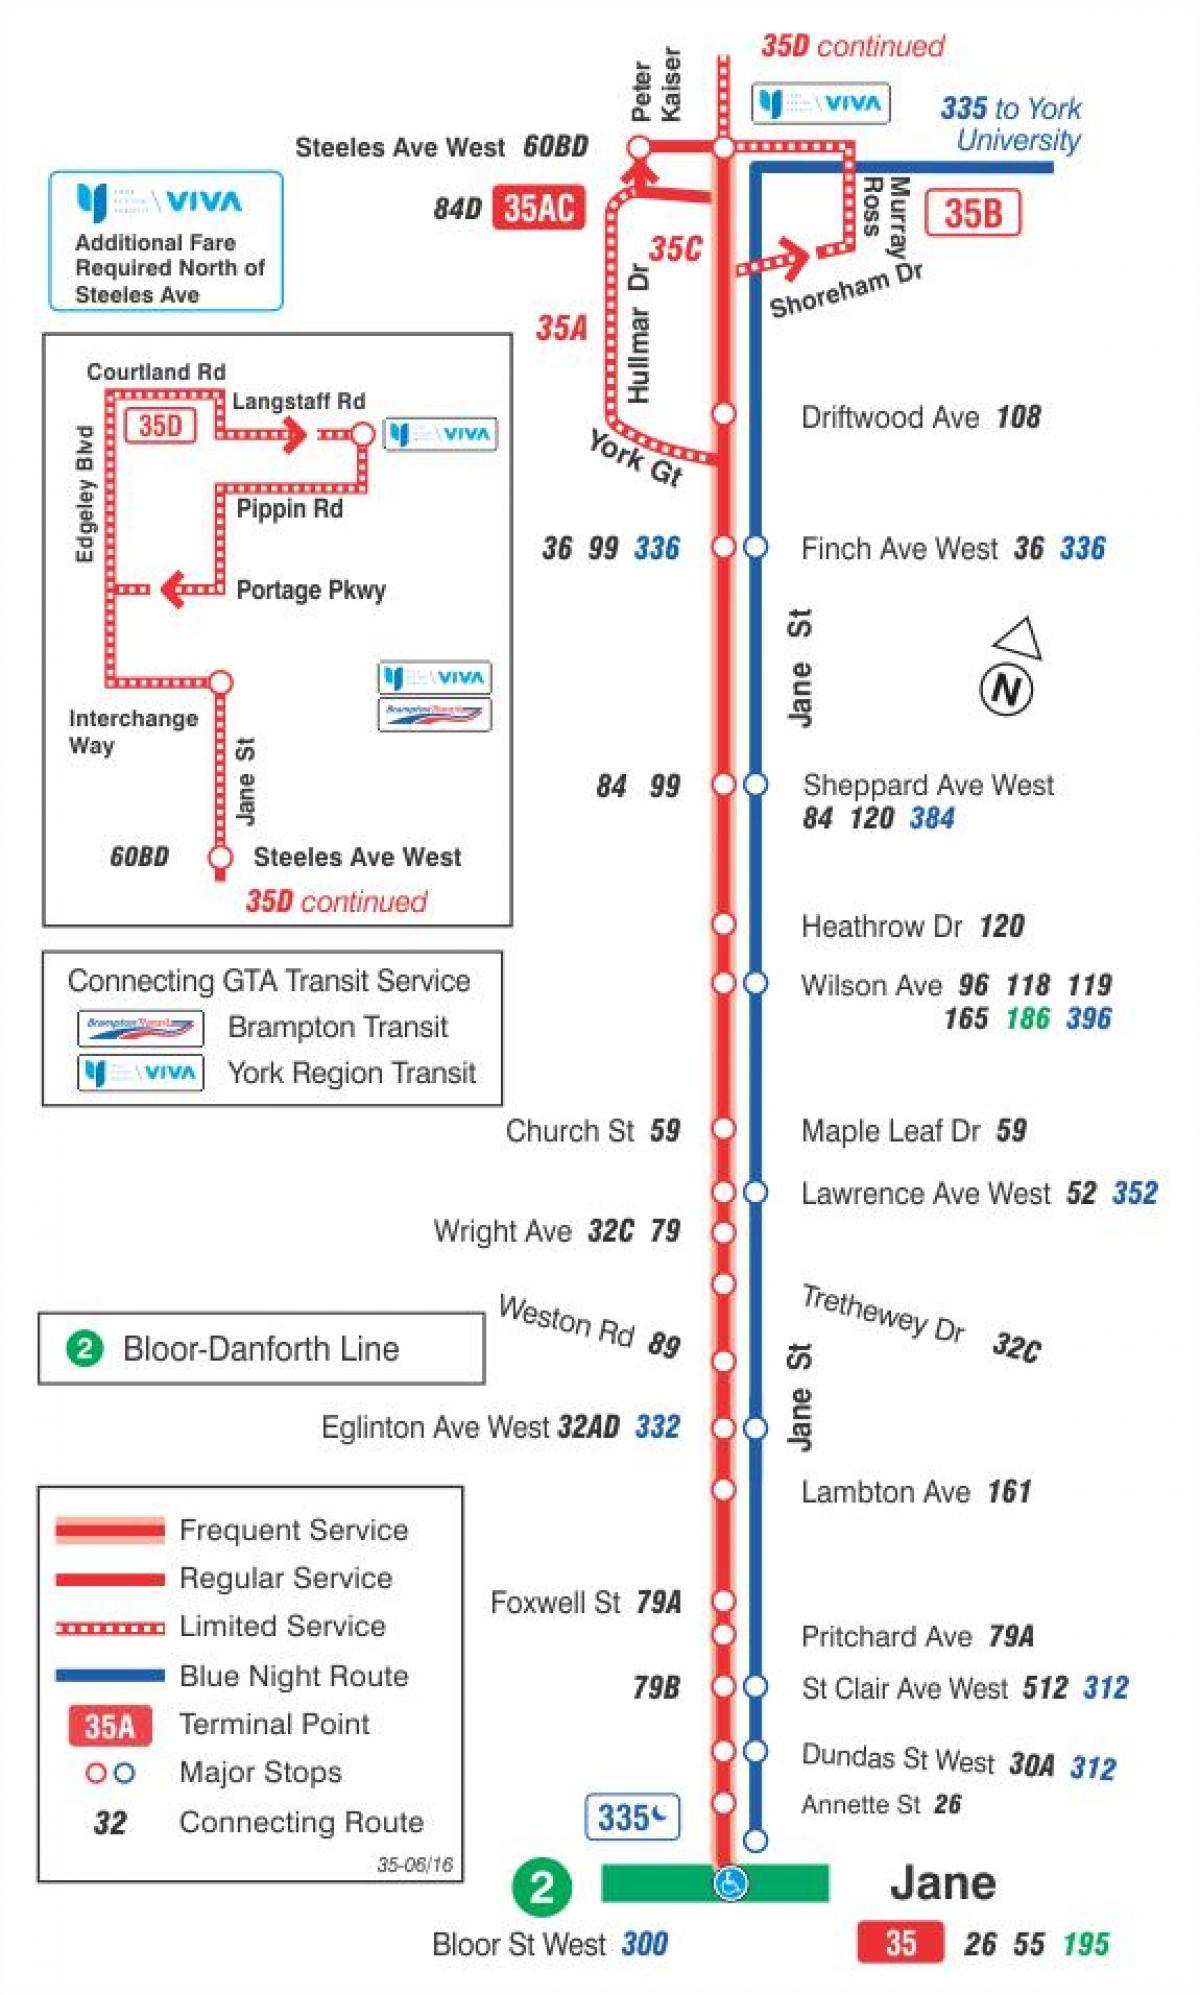 kart rute TTC 35 Jane buss rute Toronto kart   Kart over TTC 35 Jane buss  kart rute